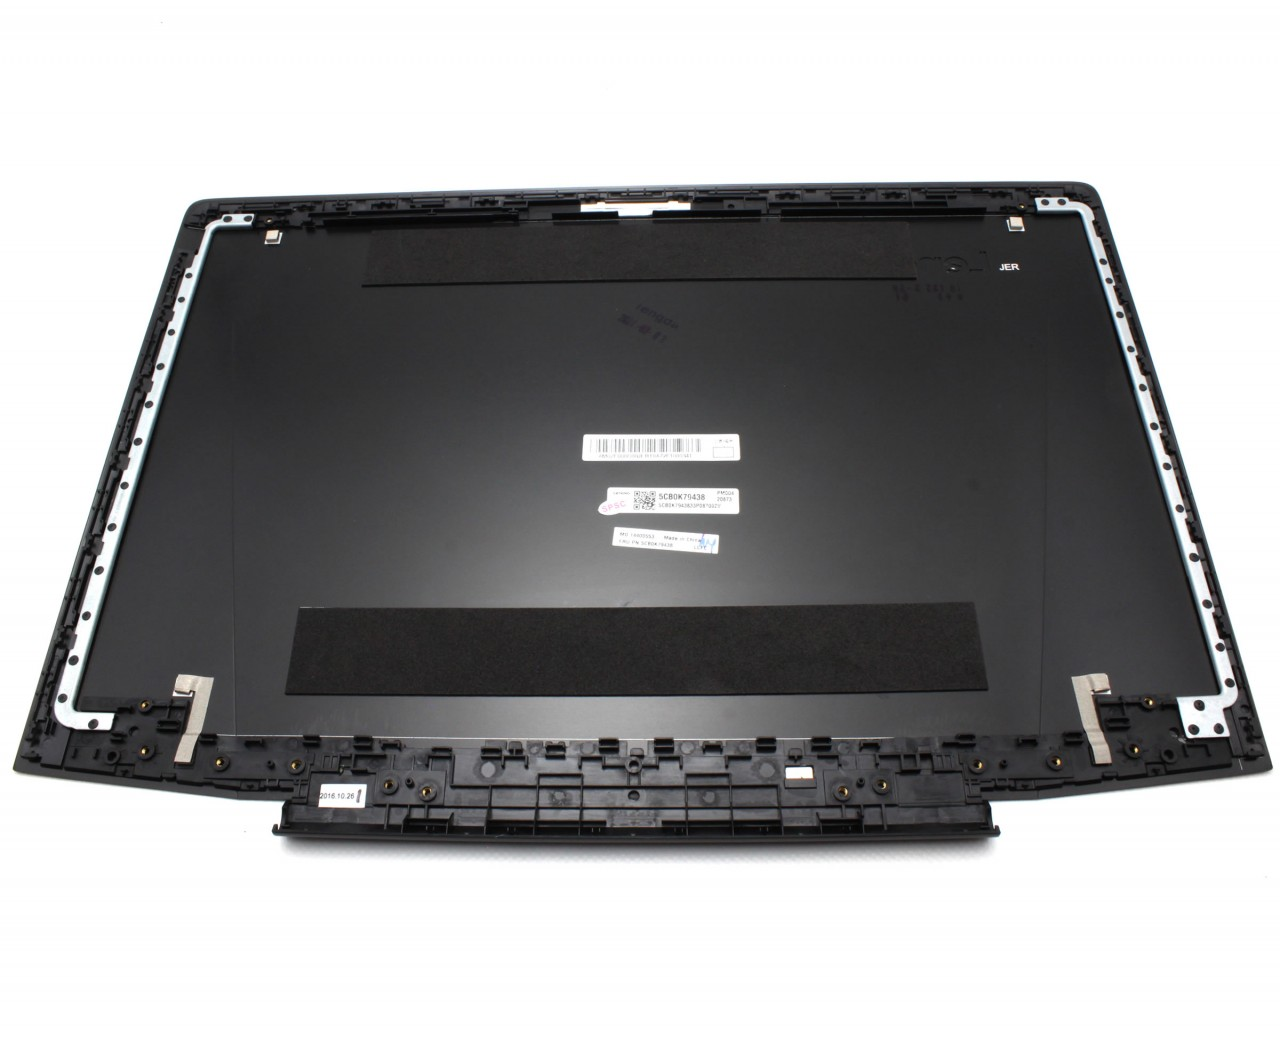 Capac Display BackCover Lenovo IdeaPad Y700-15ISK Carcasa Display pentru laptop fara touchscreen imagine powerlaptop.ro 2021